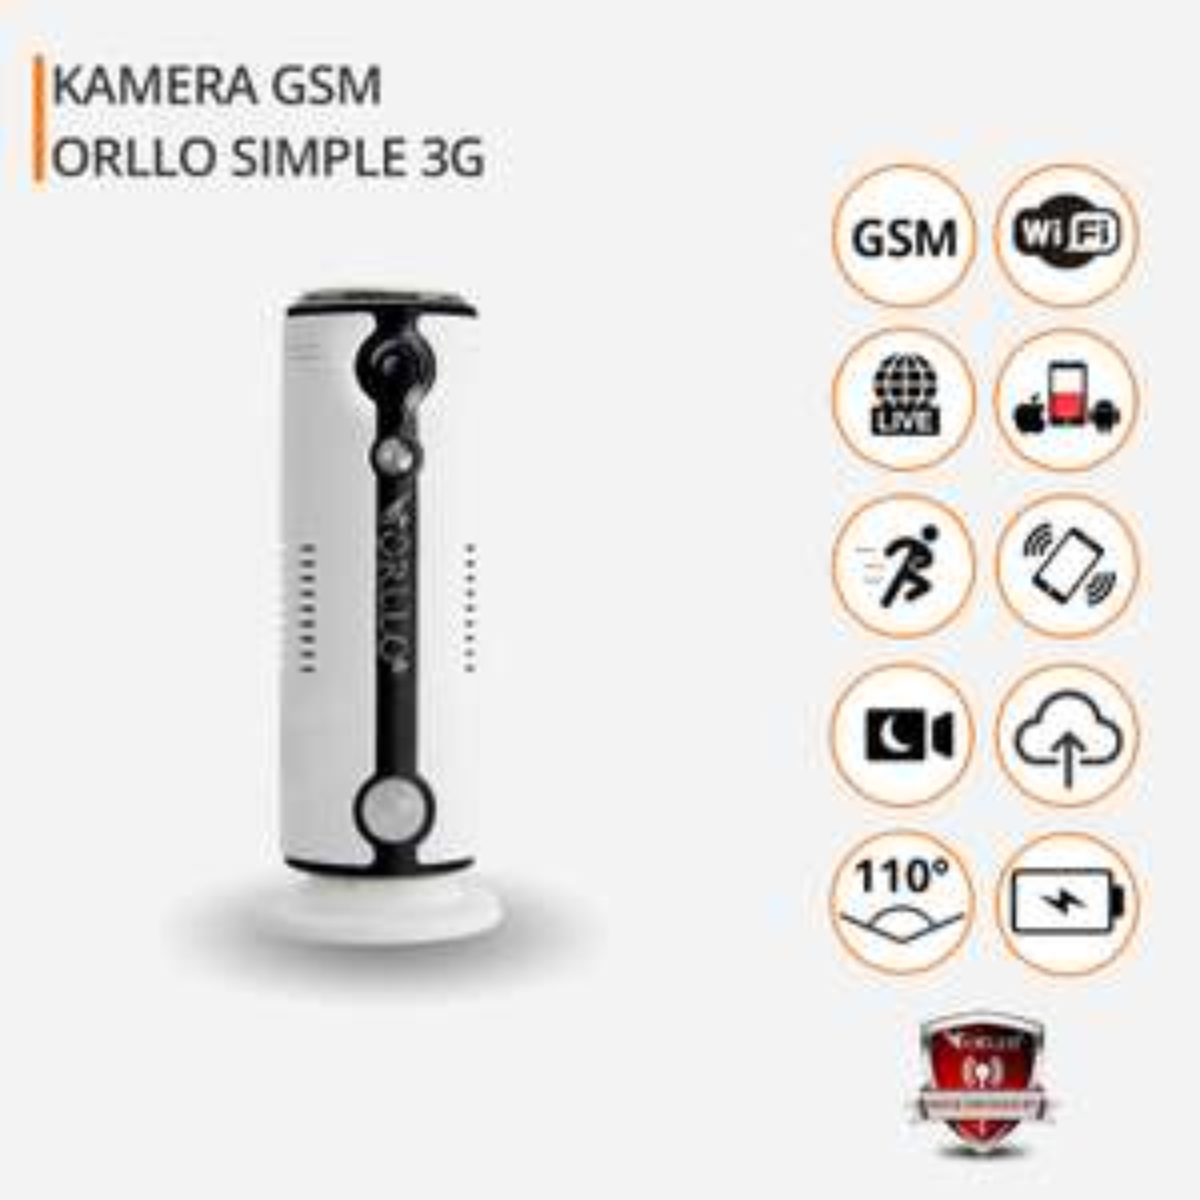 Promocja na Kamera HD Gsm Bezprzewodowa SIM Wifi/SIM 3G 4G LTE ORLLO SIMple